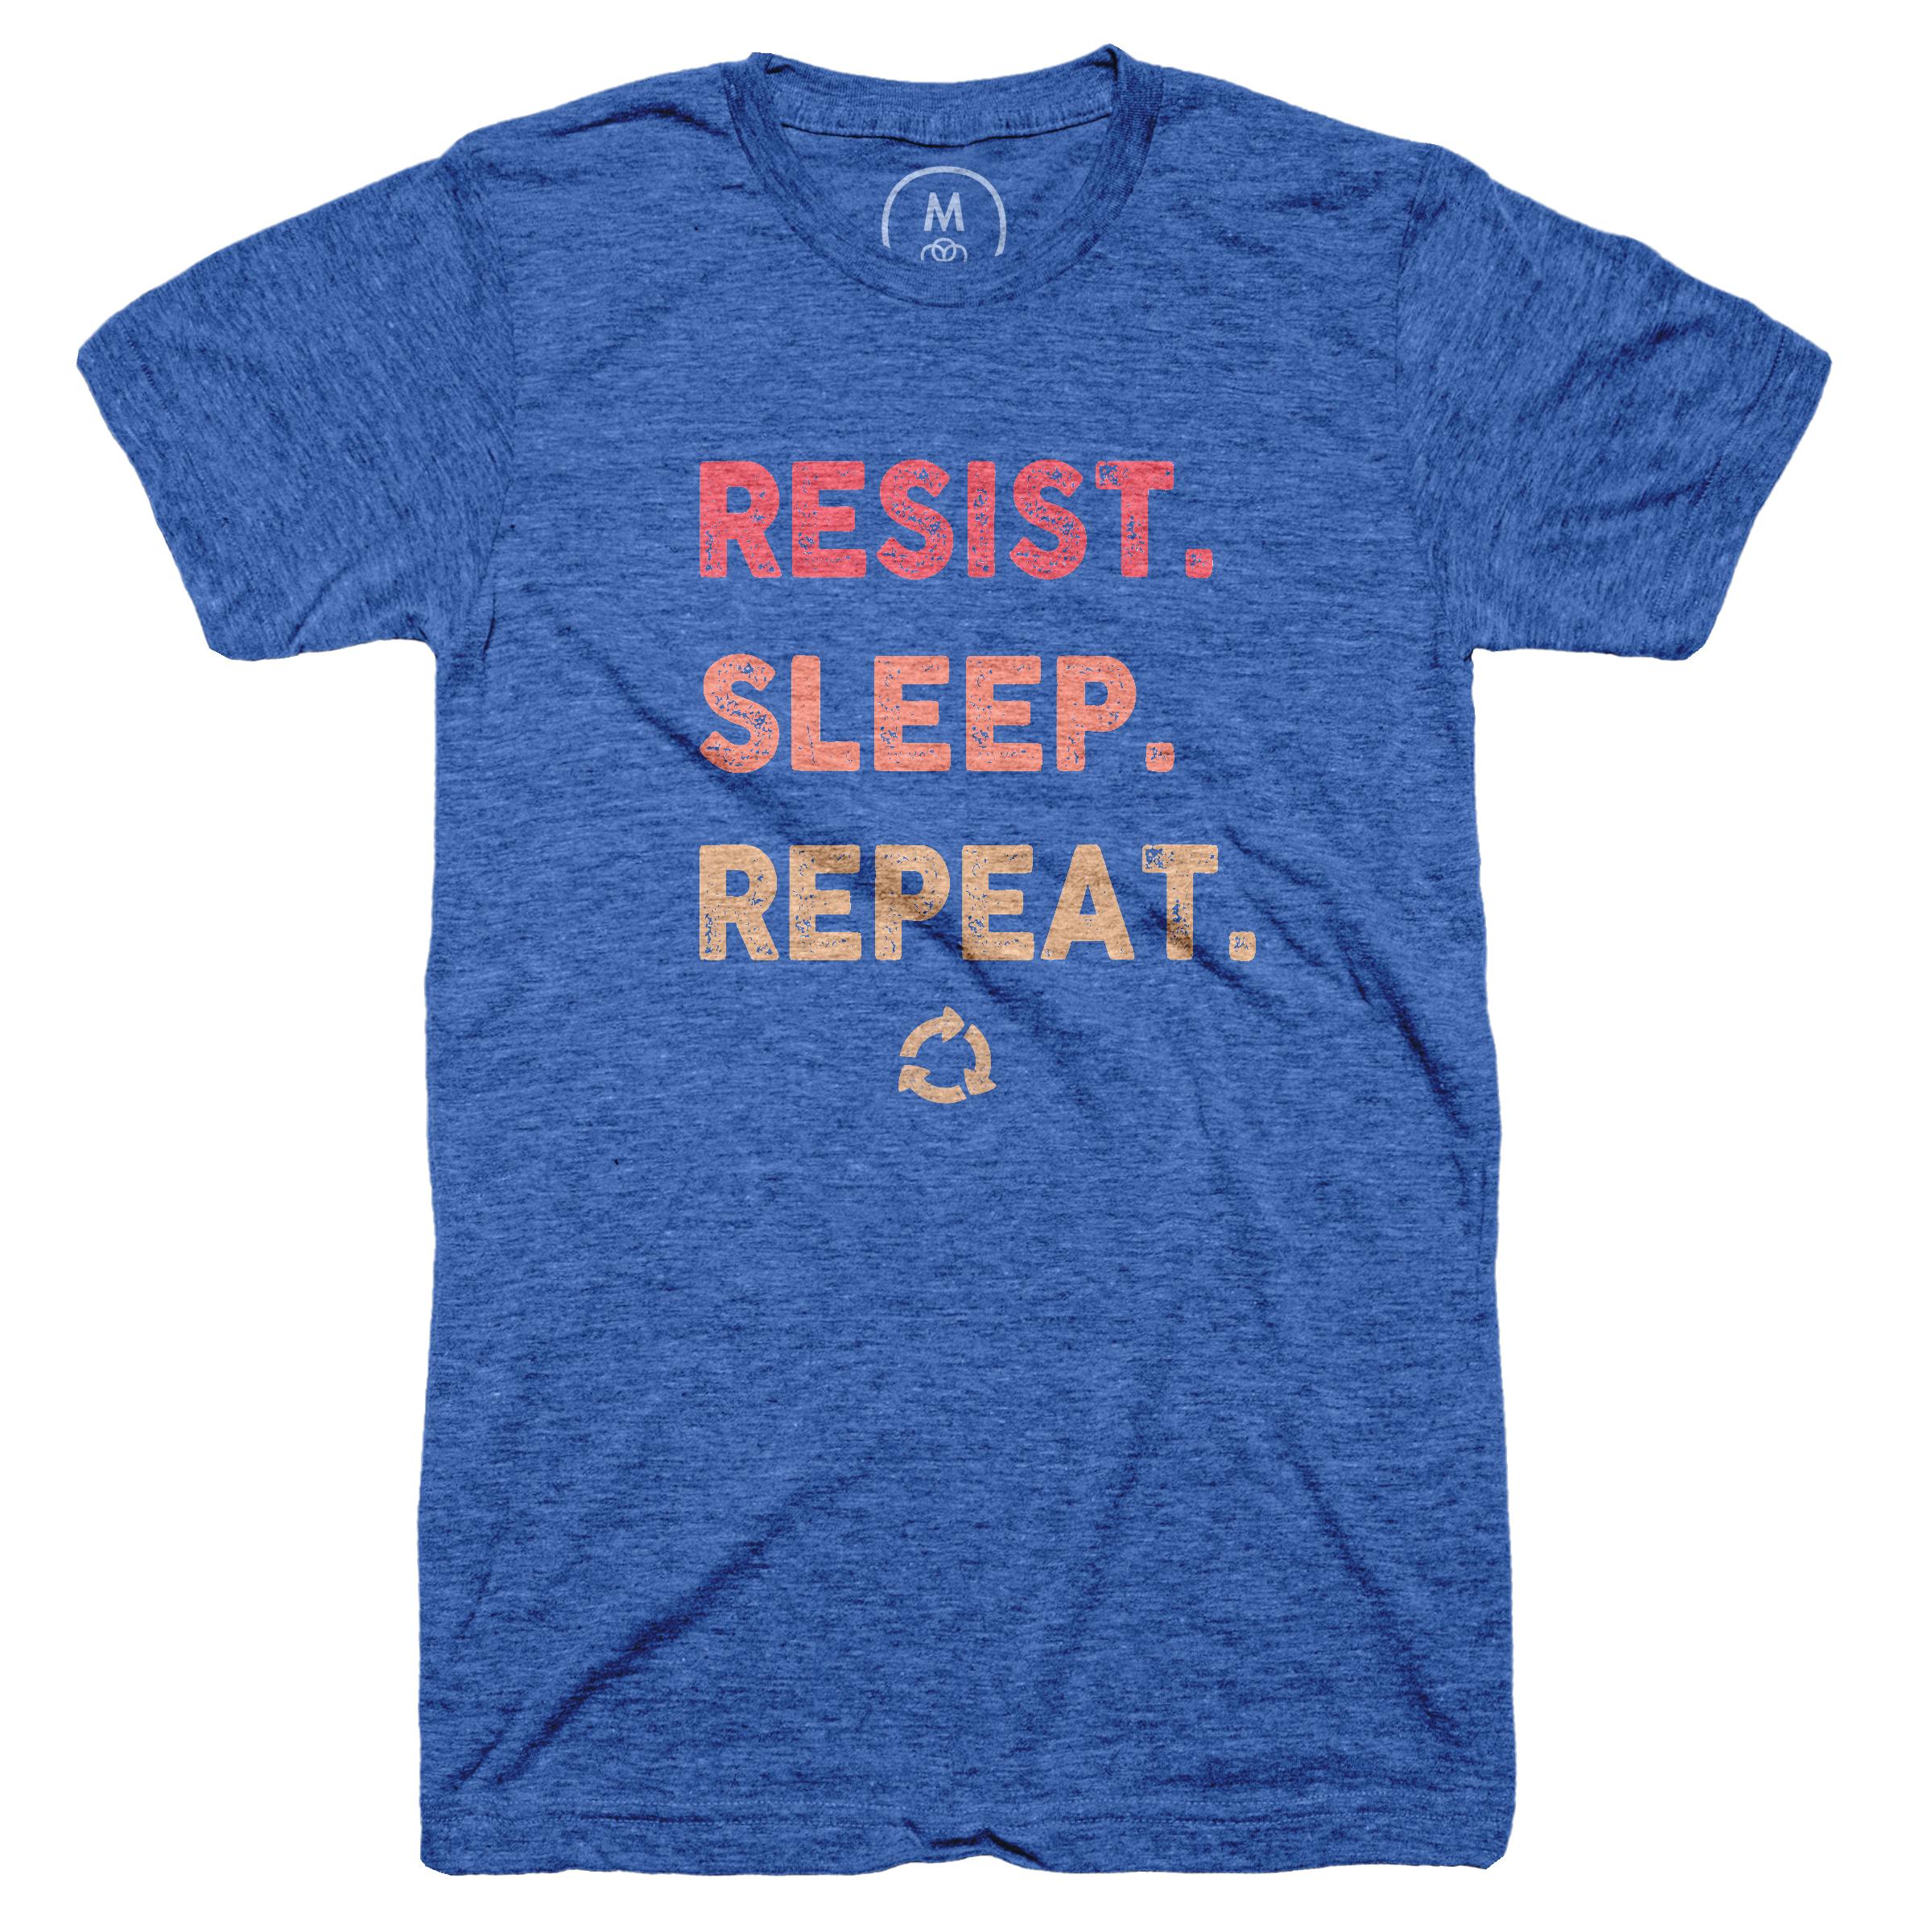 Resist. Sleep. Repeat.